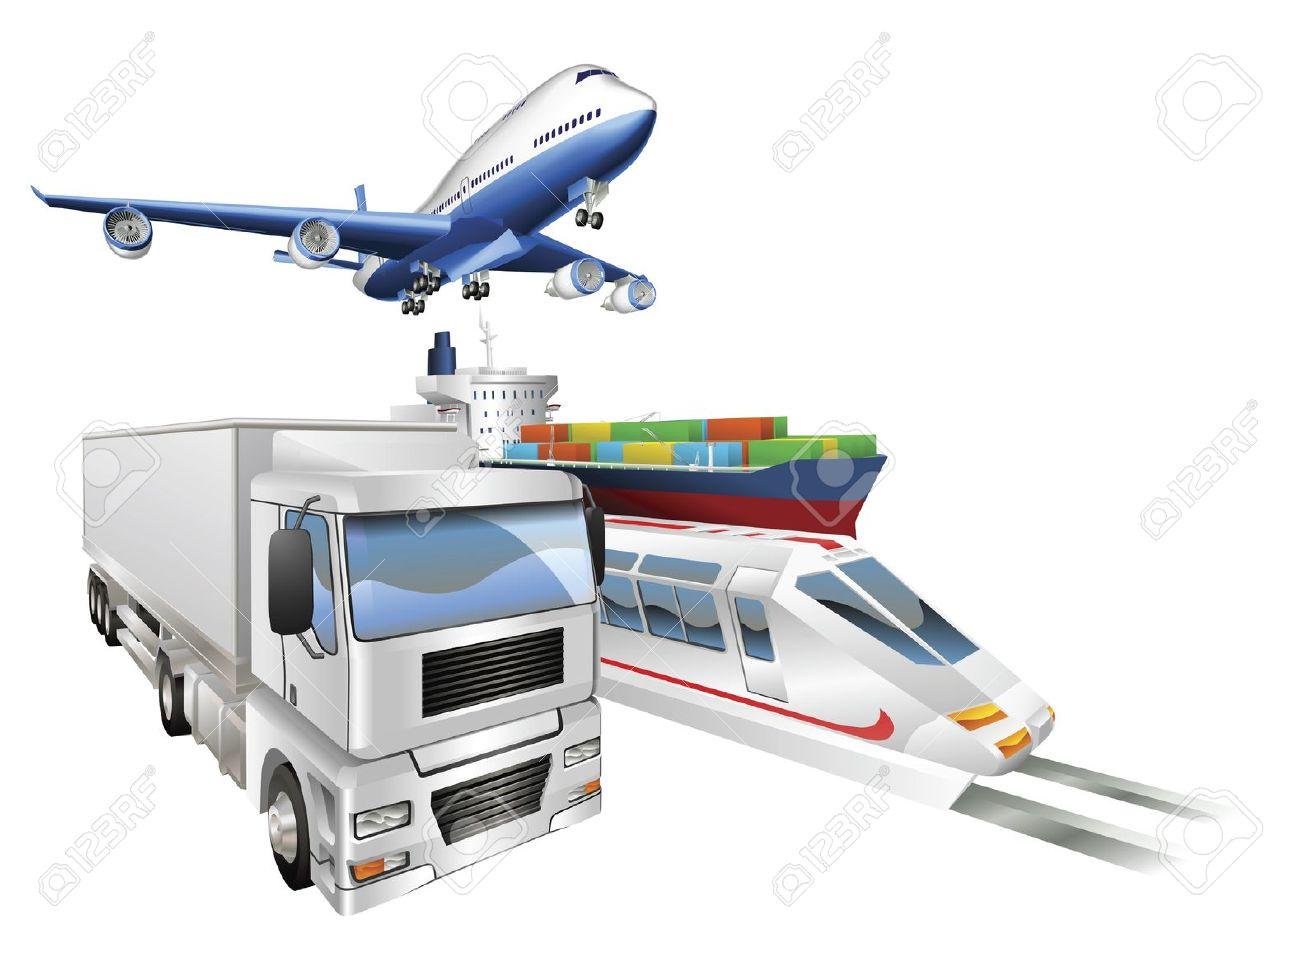 Clipartfest airplane truck . Distribution plane clipart